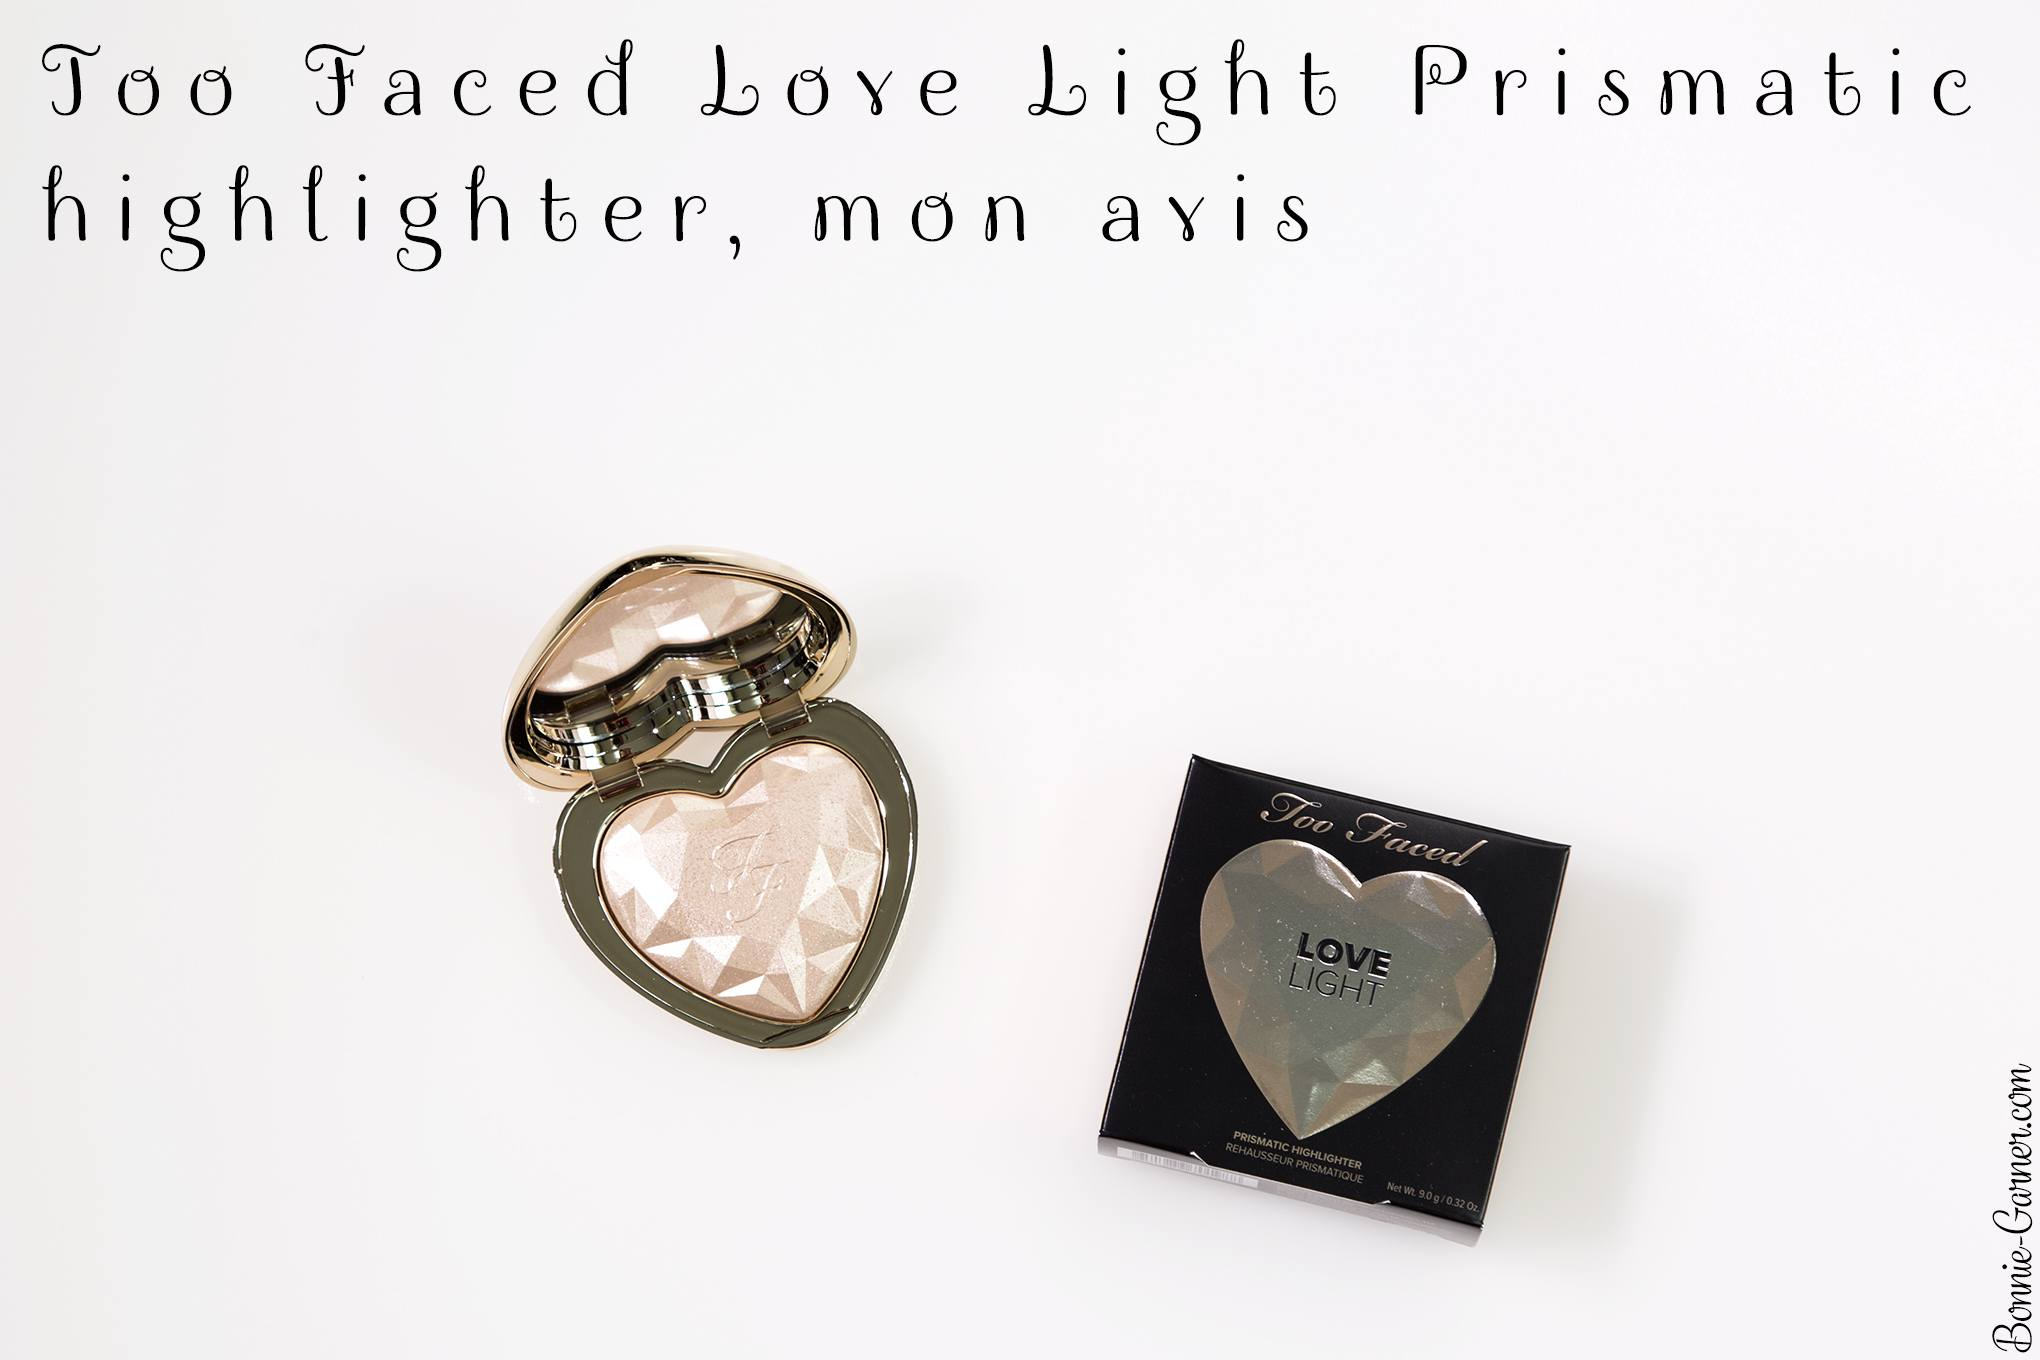 Too Faced Love Light Prismatic highlighter, mon avis